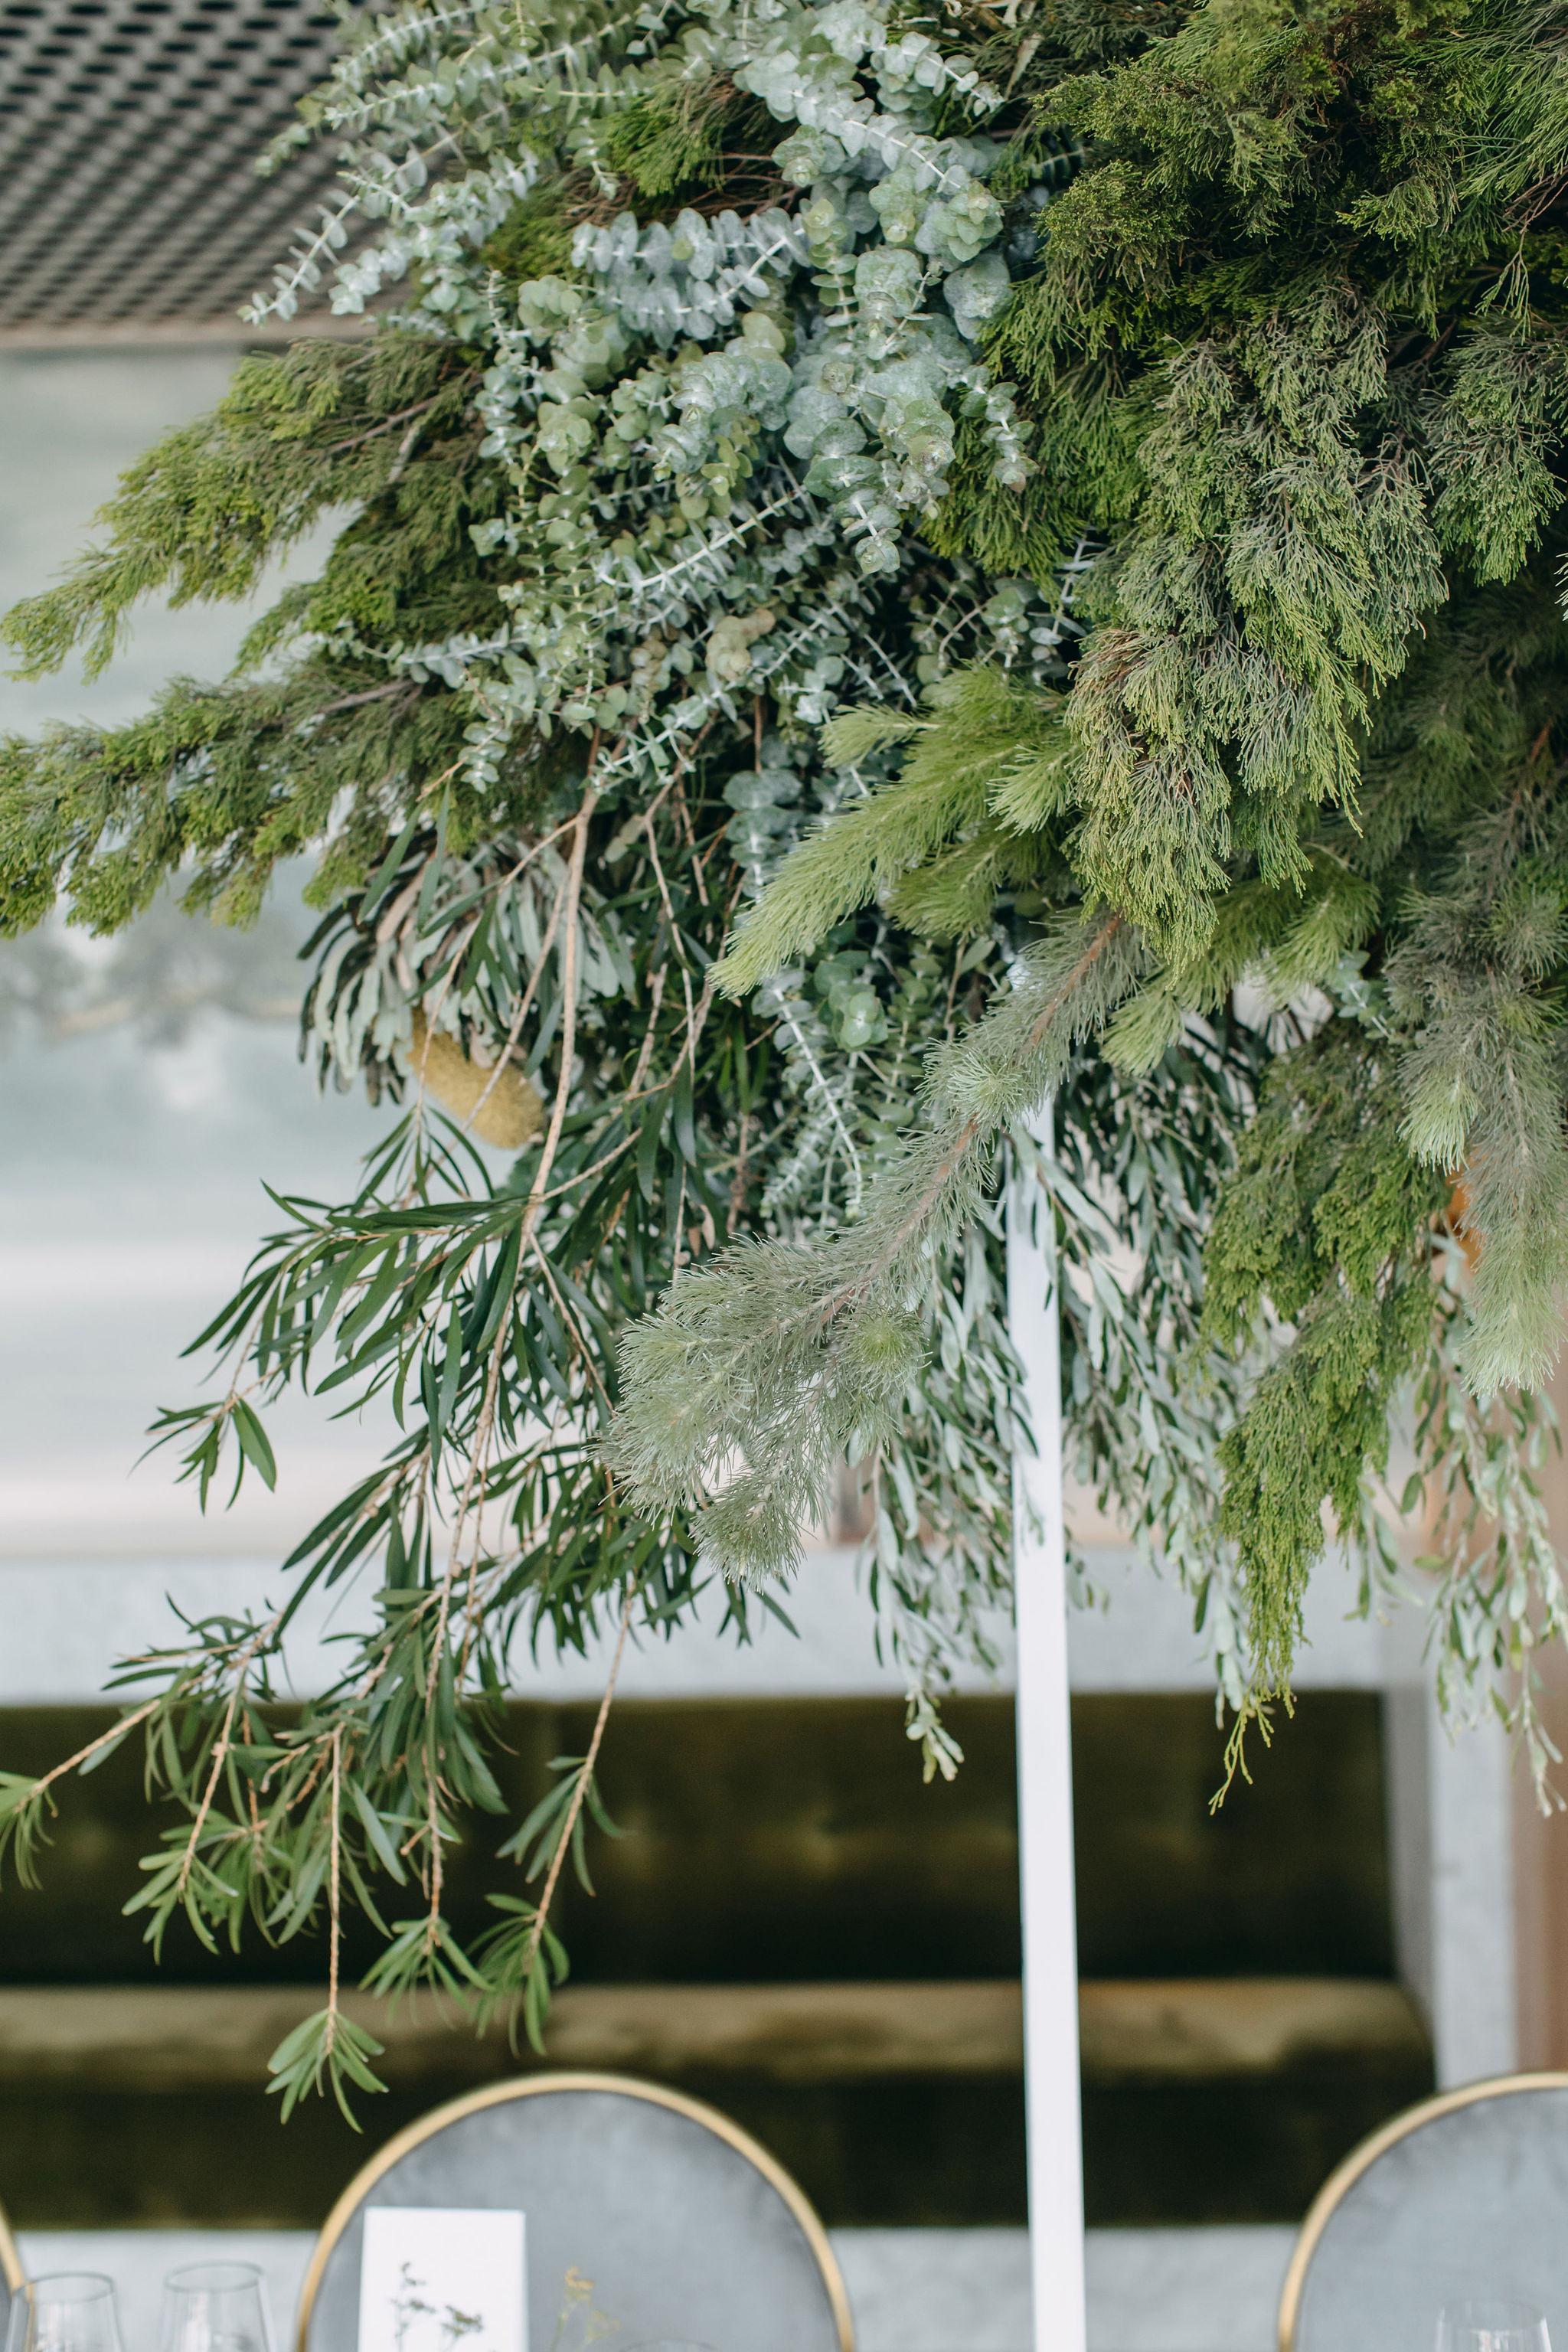 269-STATEBUILDINGS-WEDDINGOPENDAY-16FEB2020